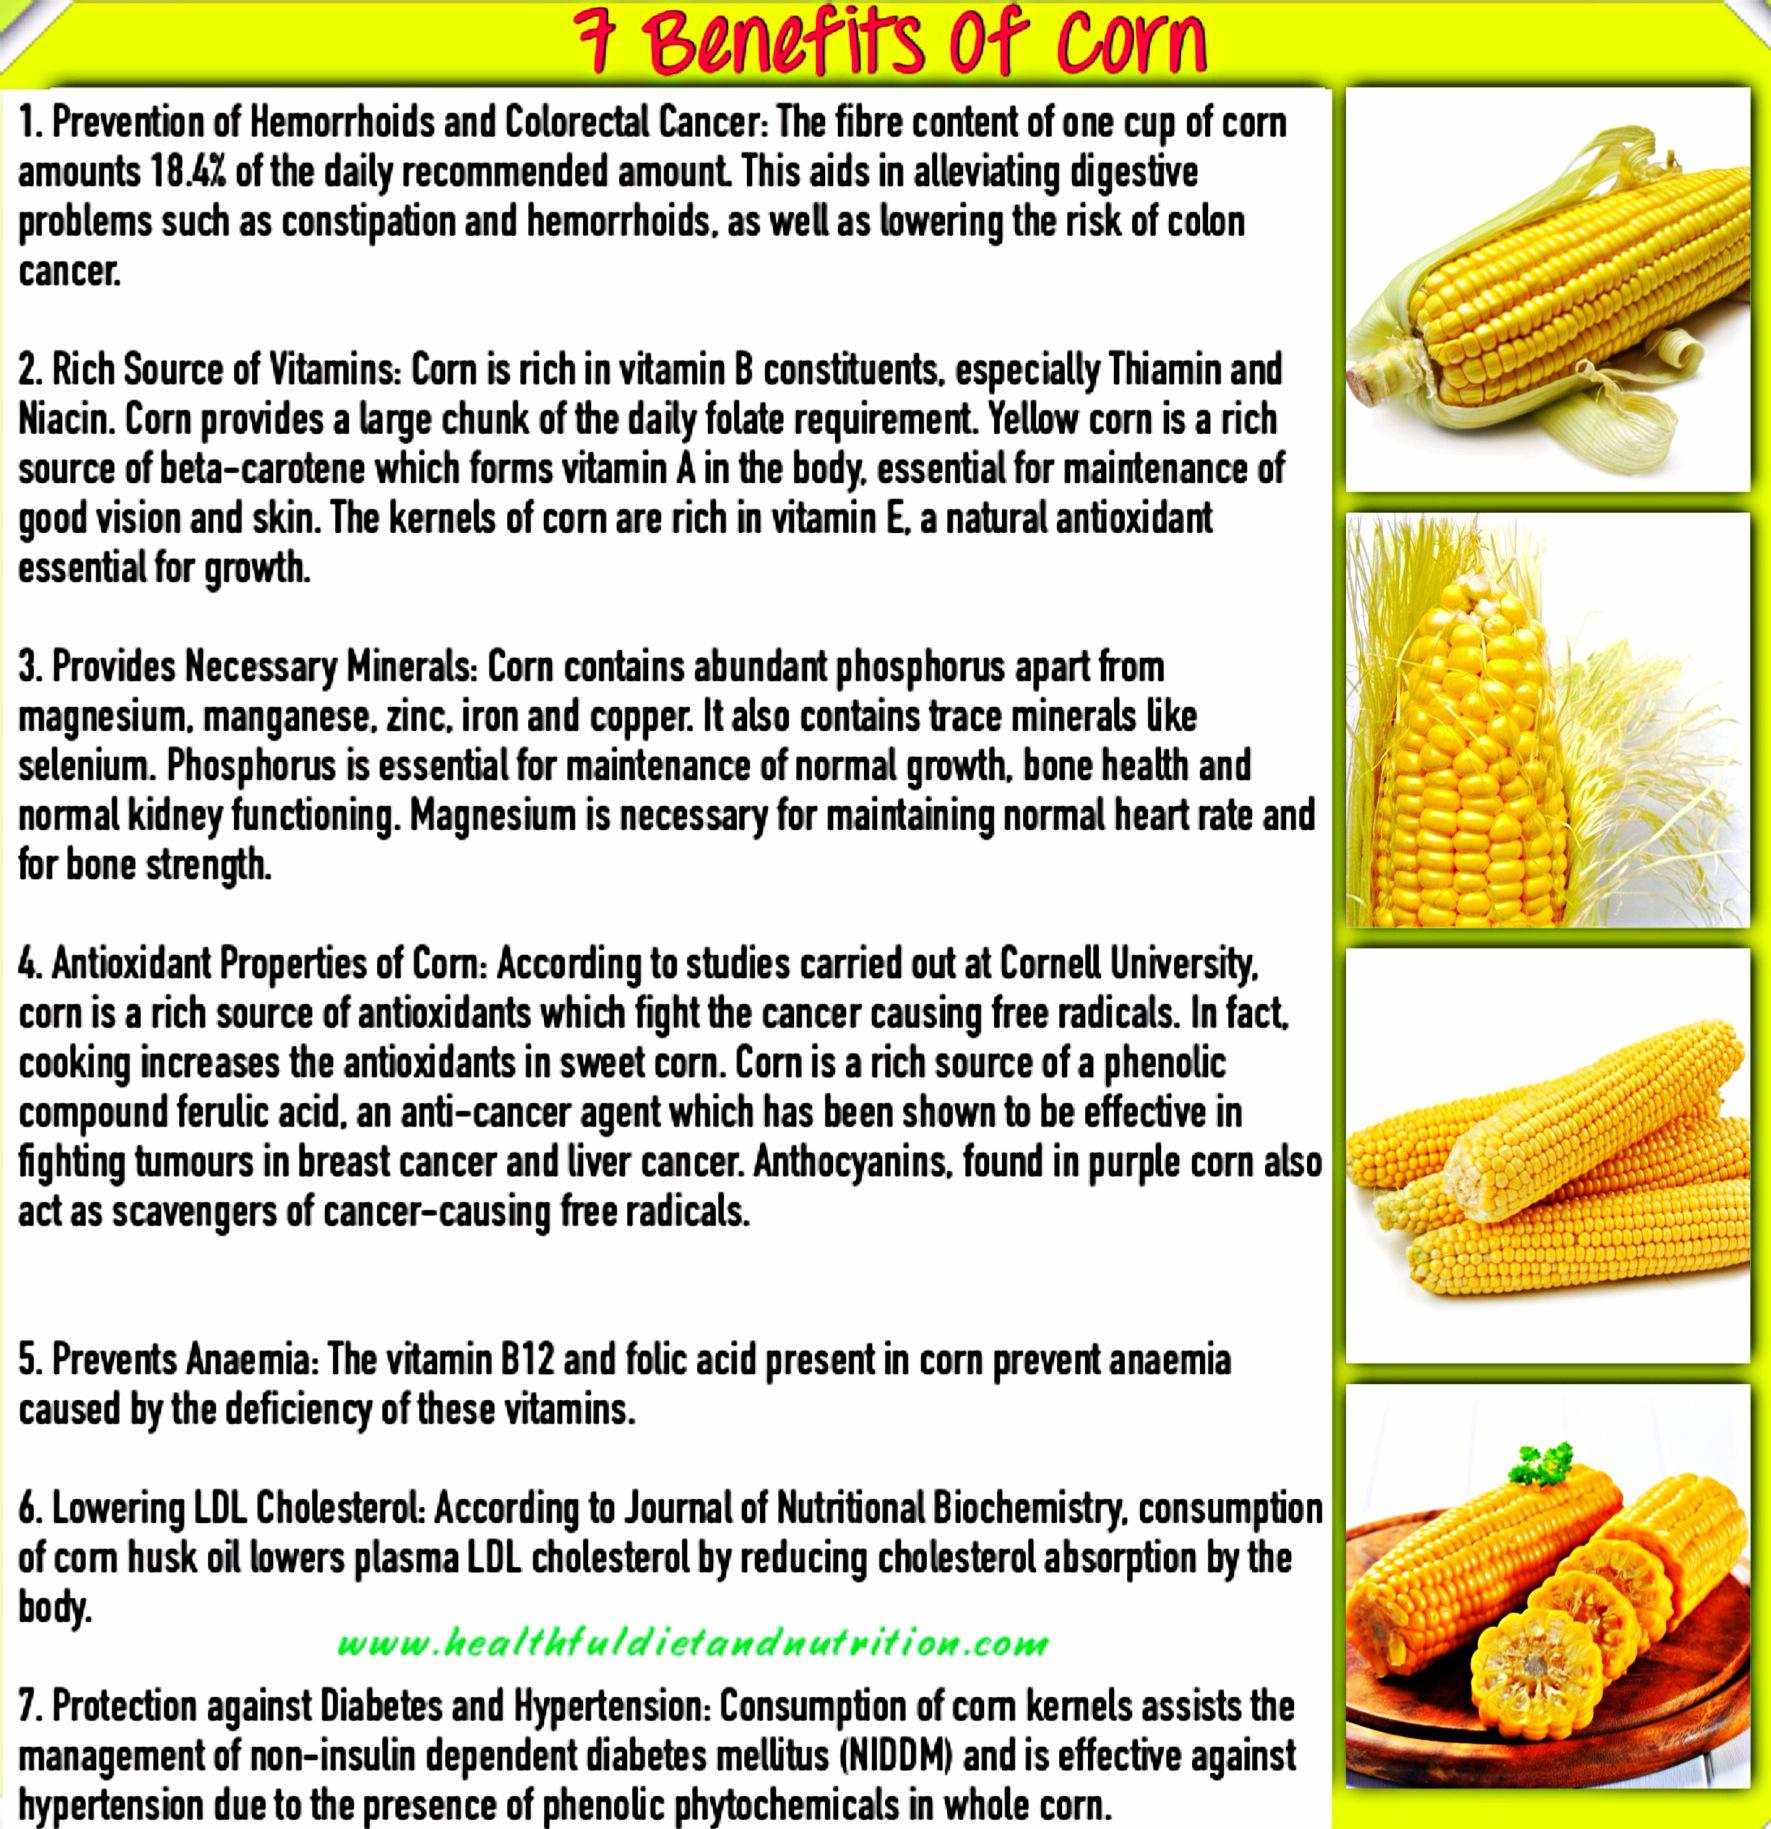 7 Health Benefits of Corn